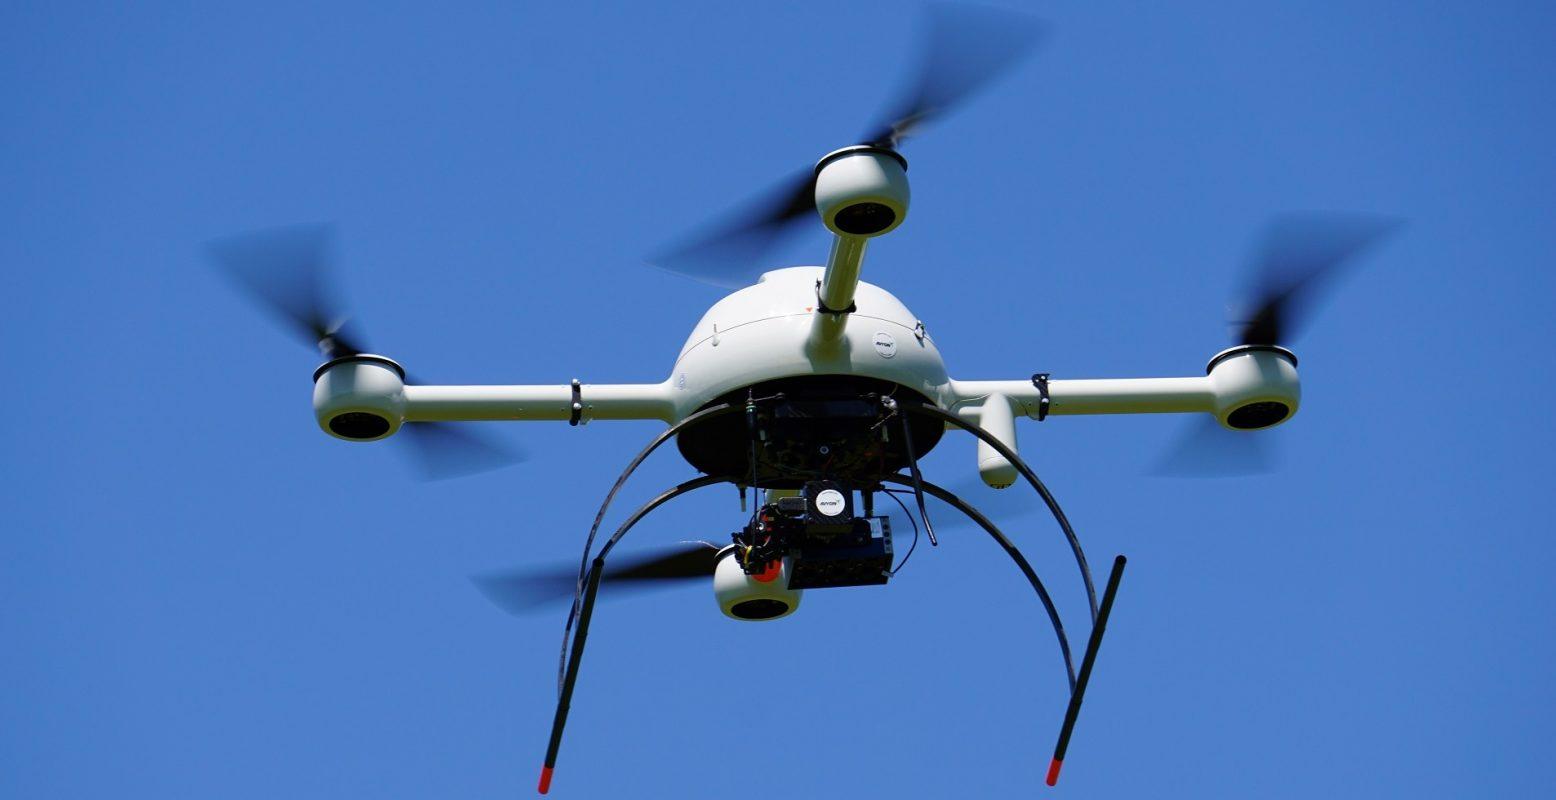 EagleView Roof Measurement & Aerial Measurement Service